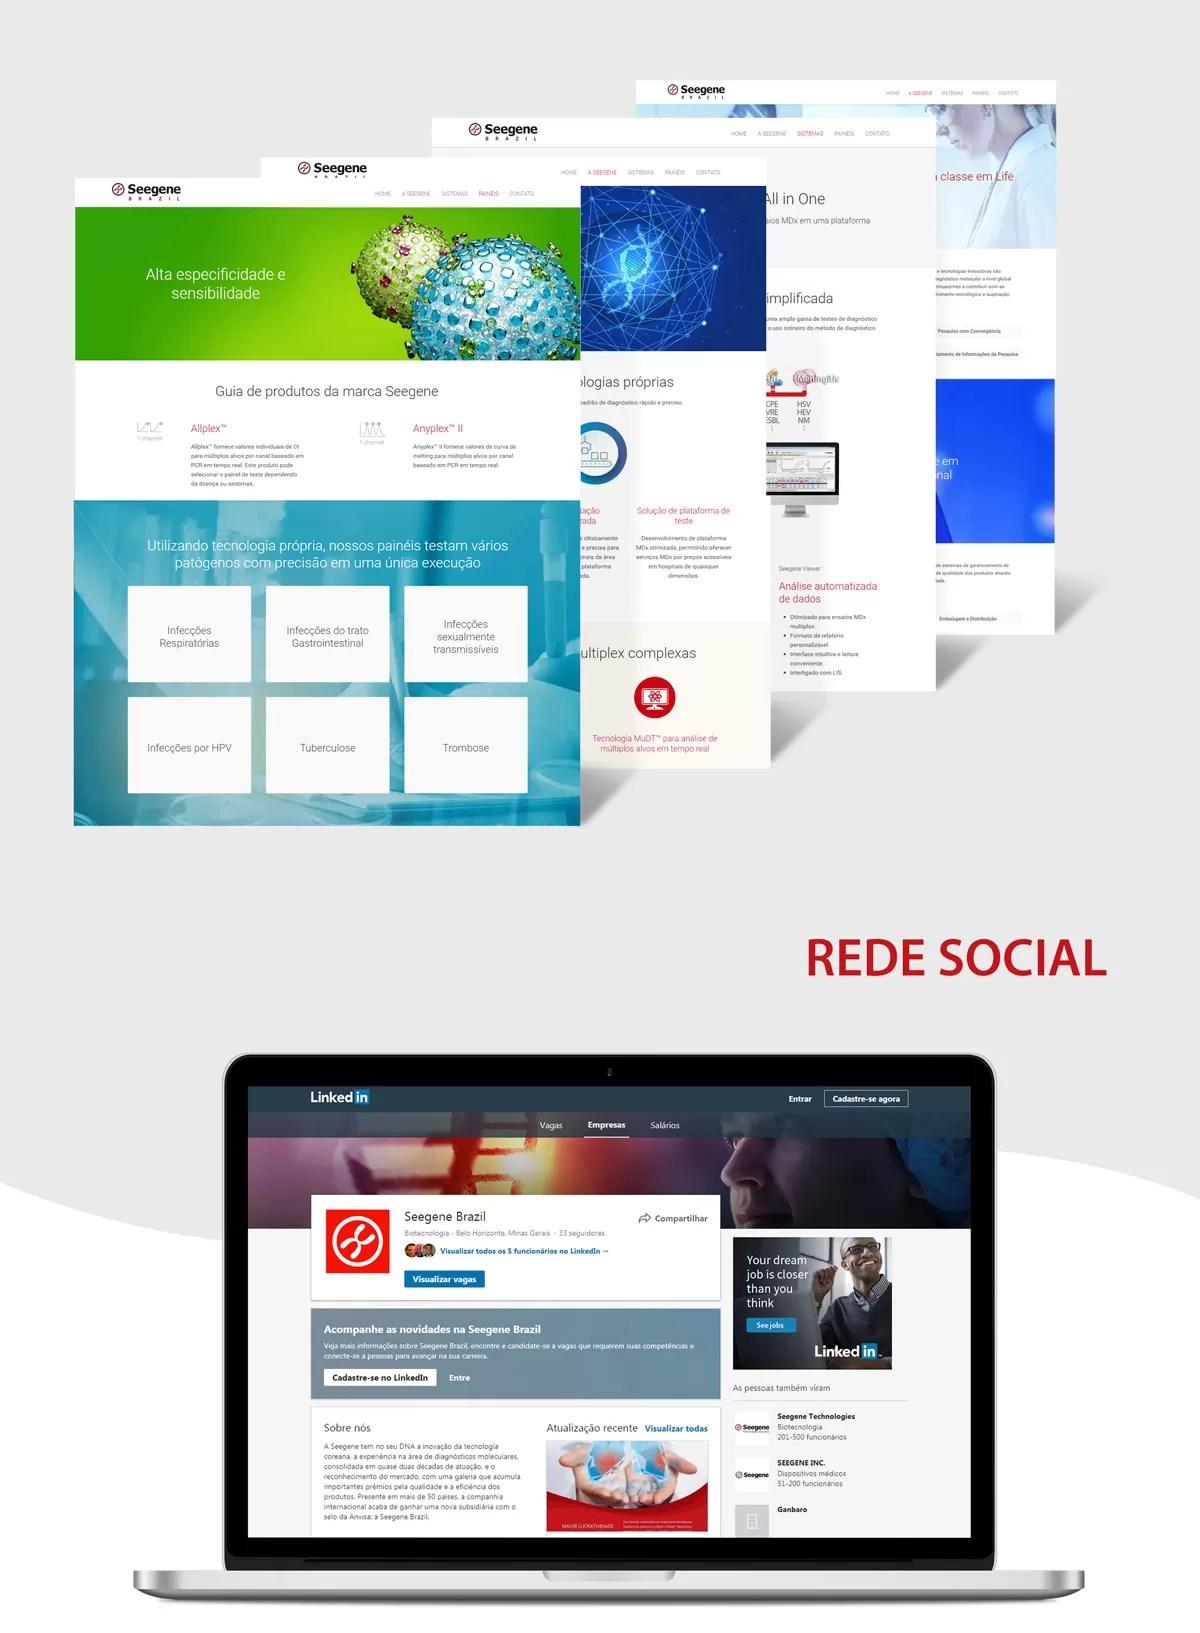 Company page Linkedin Seegene do Brazil